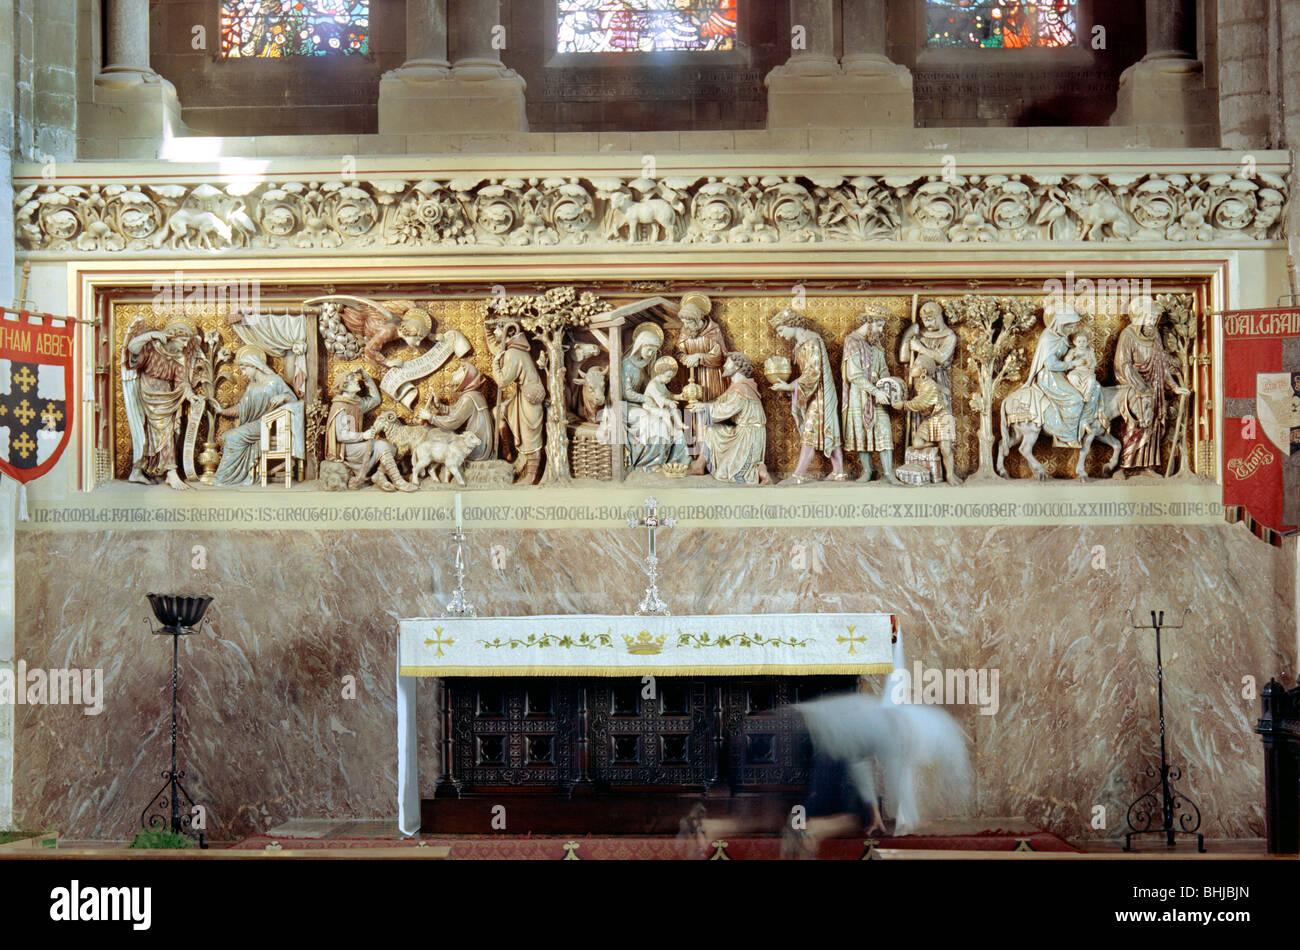 Reredos at Waltham Abbey, Essex, 1964. Artist: Laurence Goldman - Stock Image